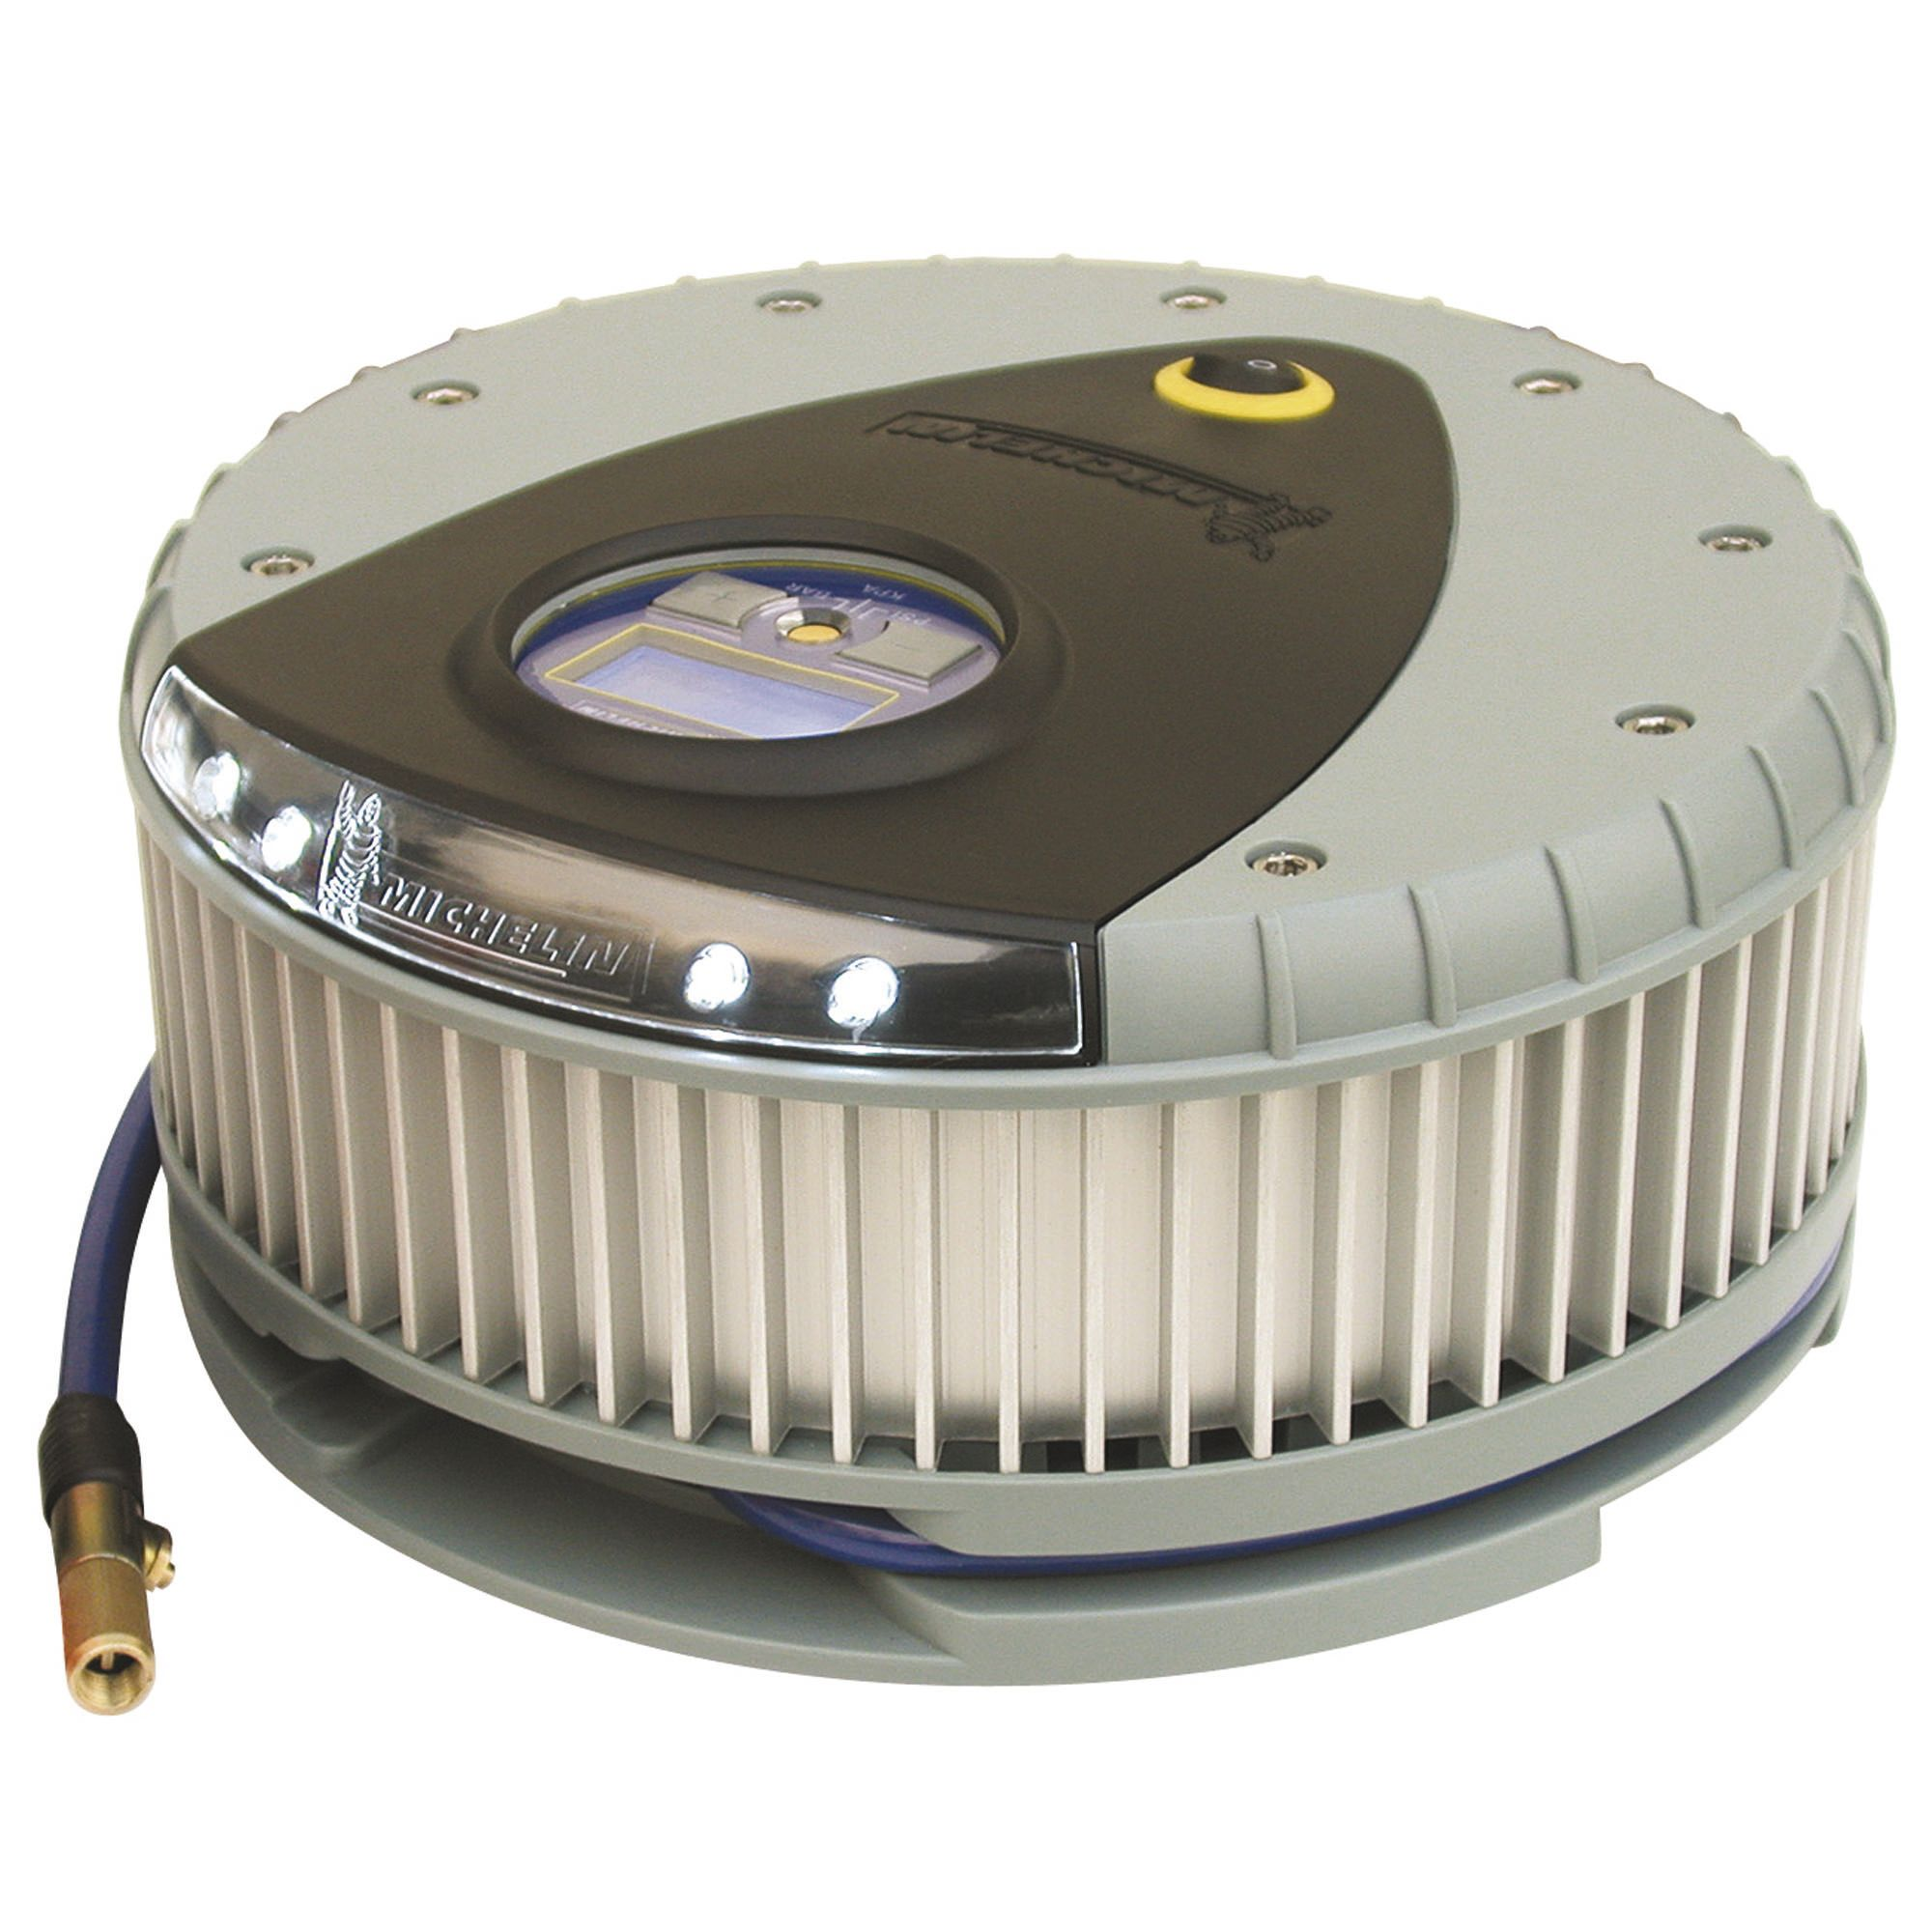 Michelin Heavy Duty Inflator Departments Diy At B Amp Q